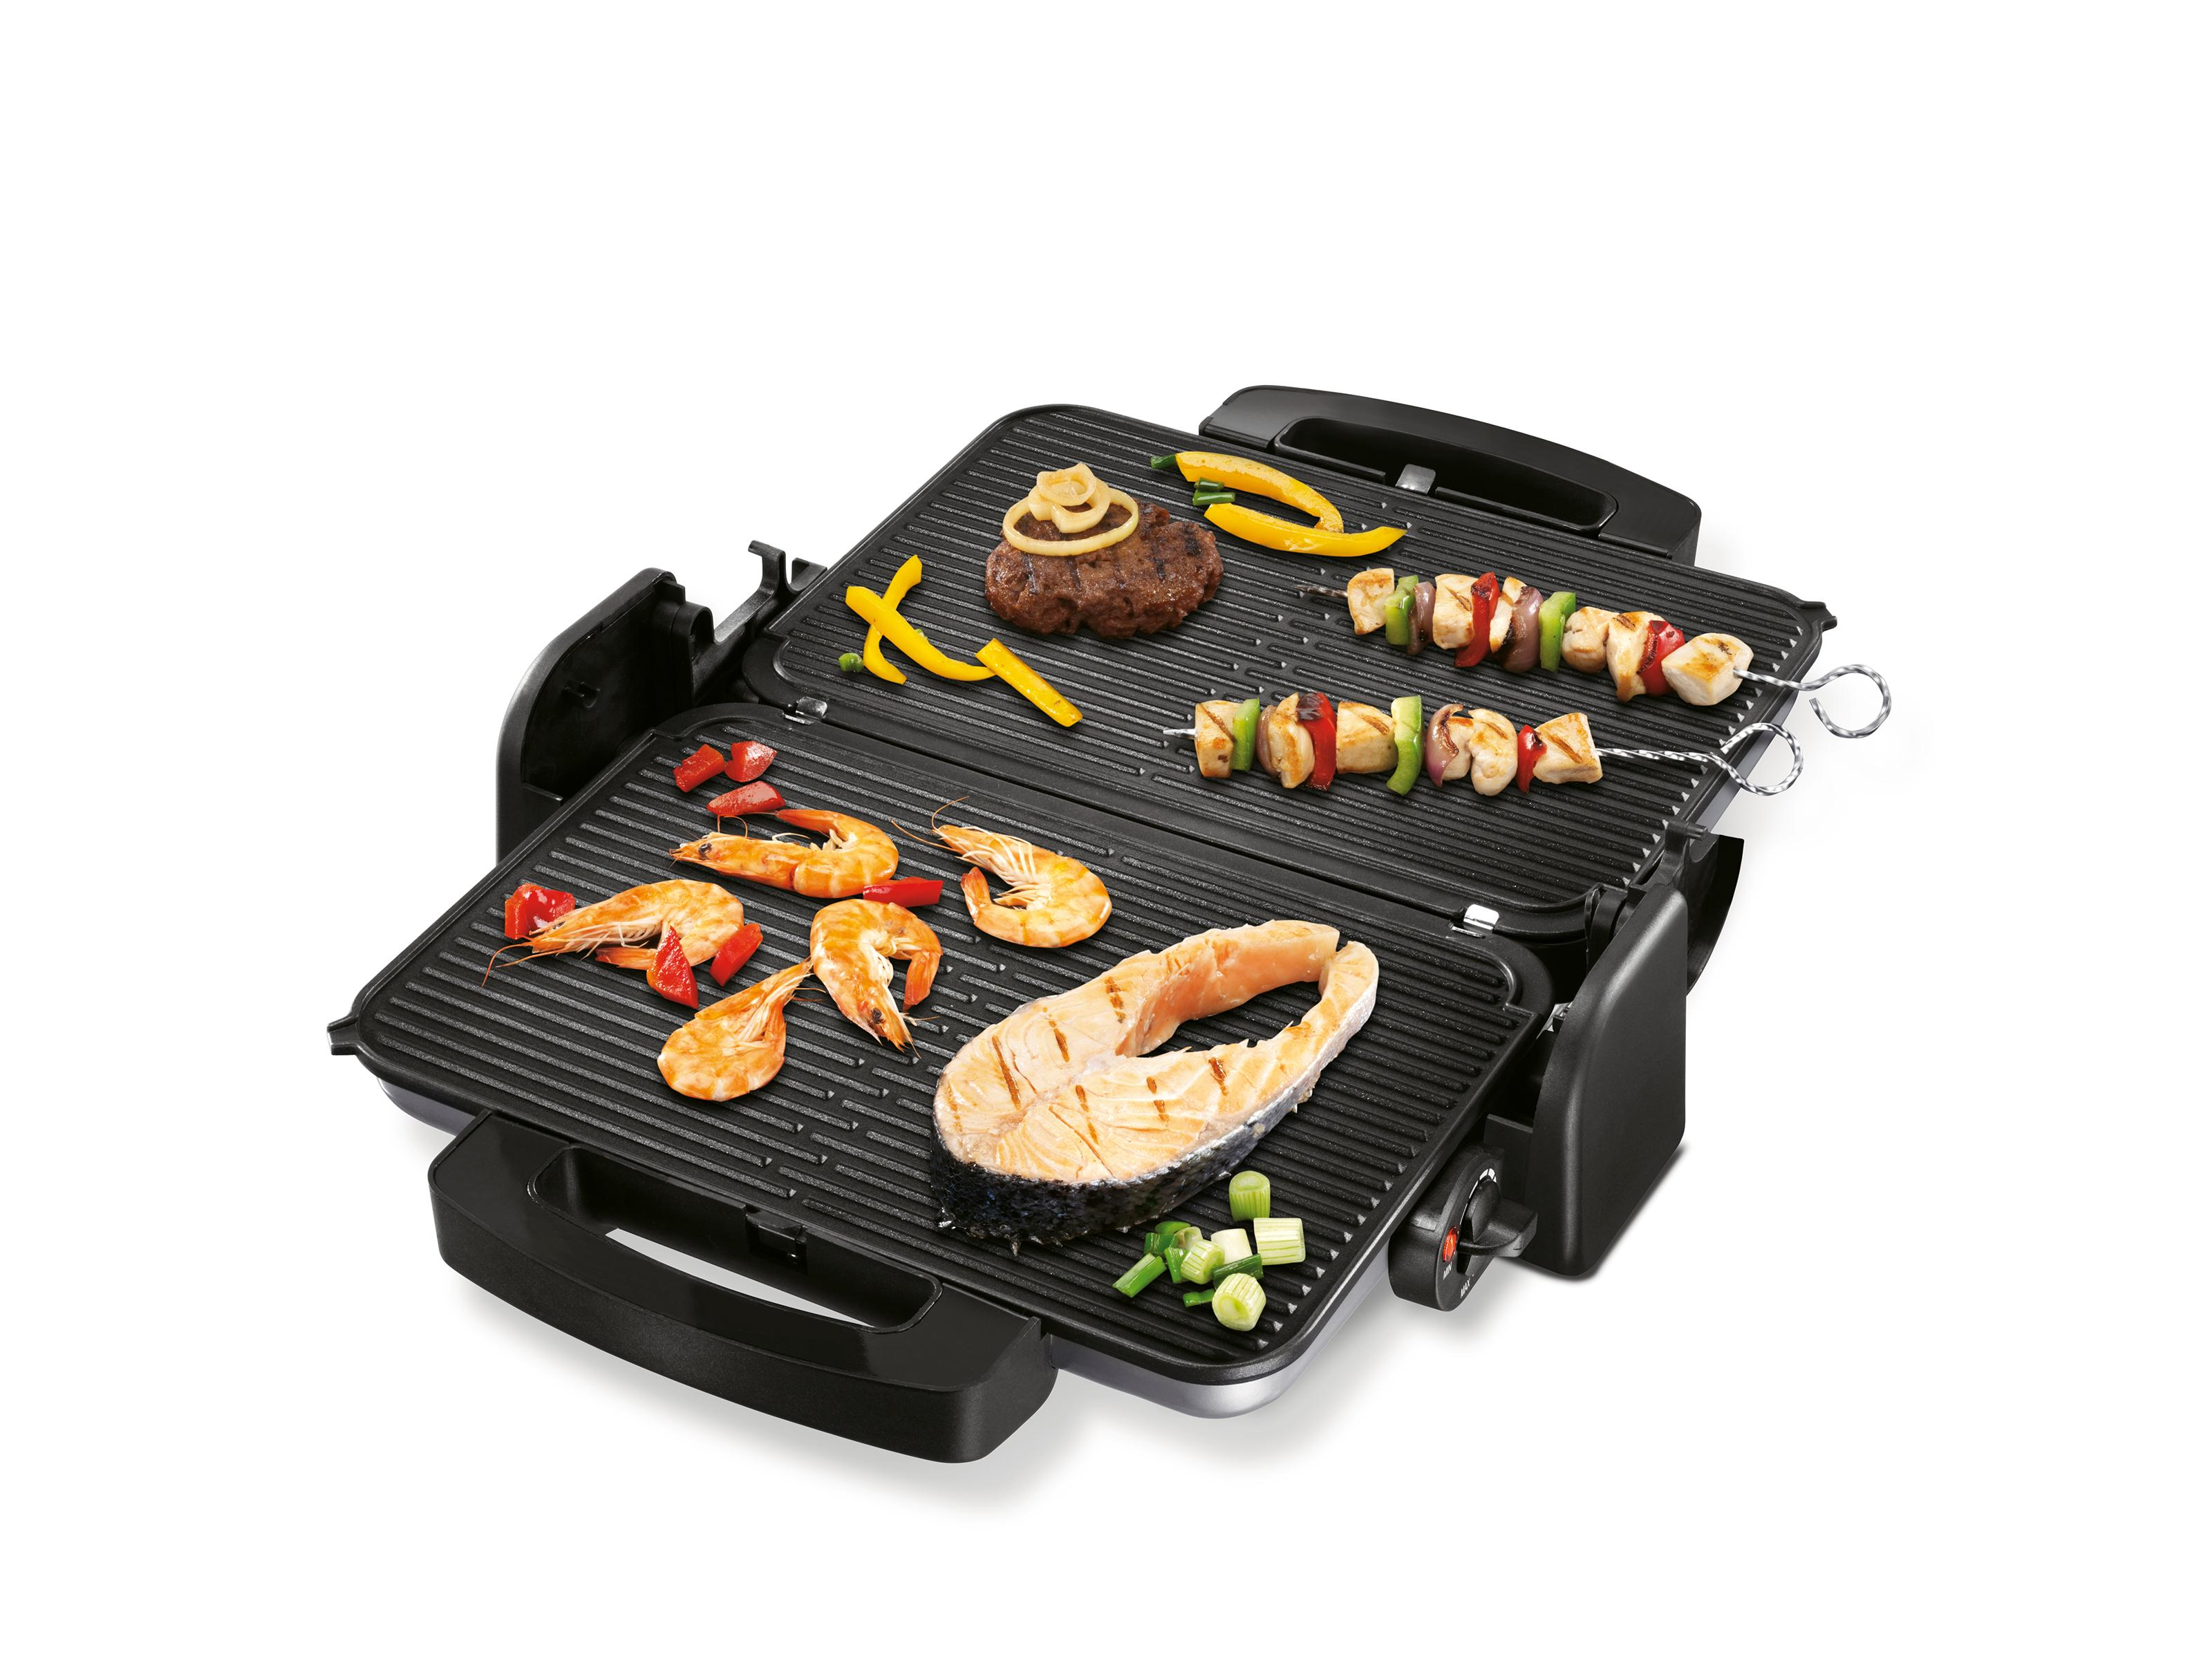 Appareil croque gaufre grill tefal astucio appareil 3 en 1 grillsauteuse posot class croque - Appareil a gaufre tefal ...